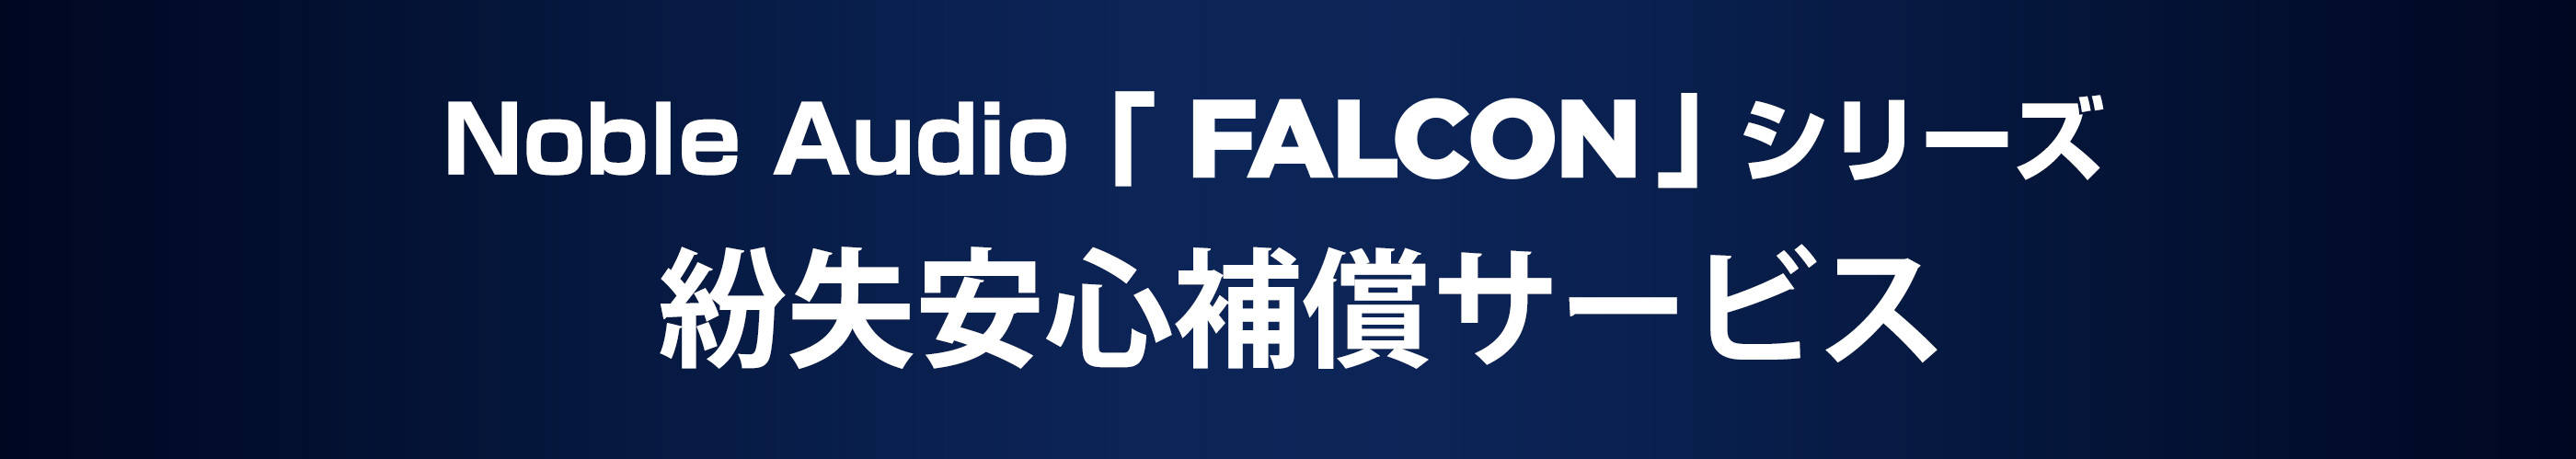 Noble Audio「FALCON 2/ FALCON PRO」 紛失安心補償サービス